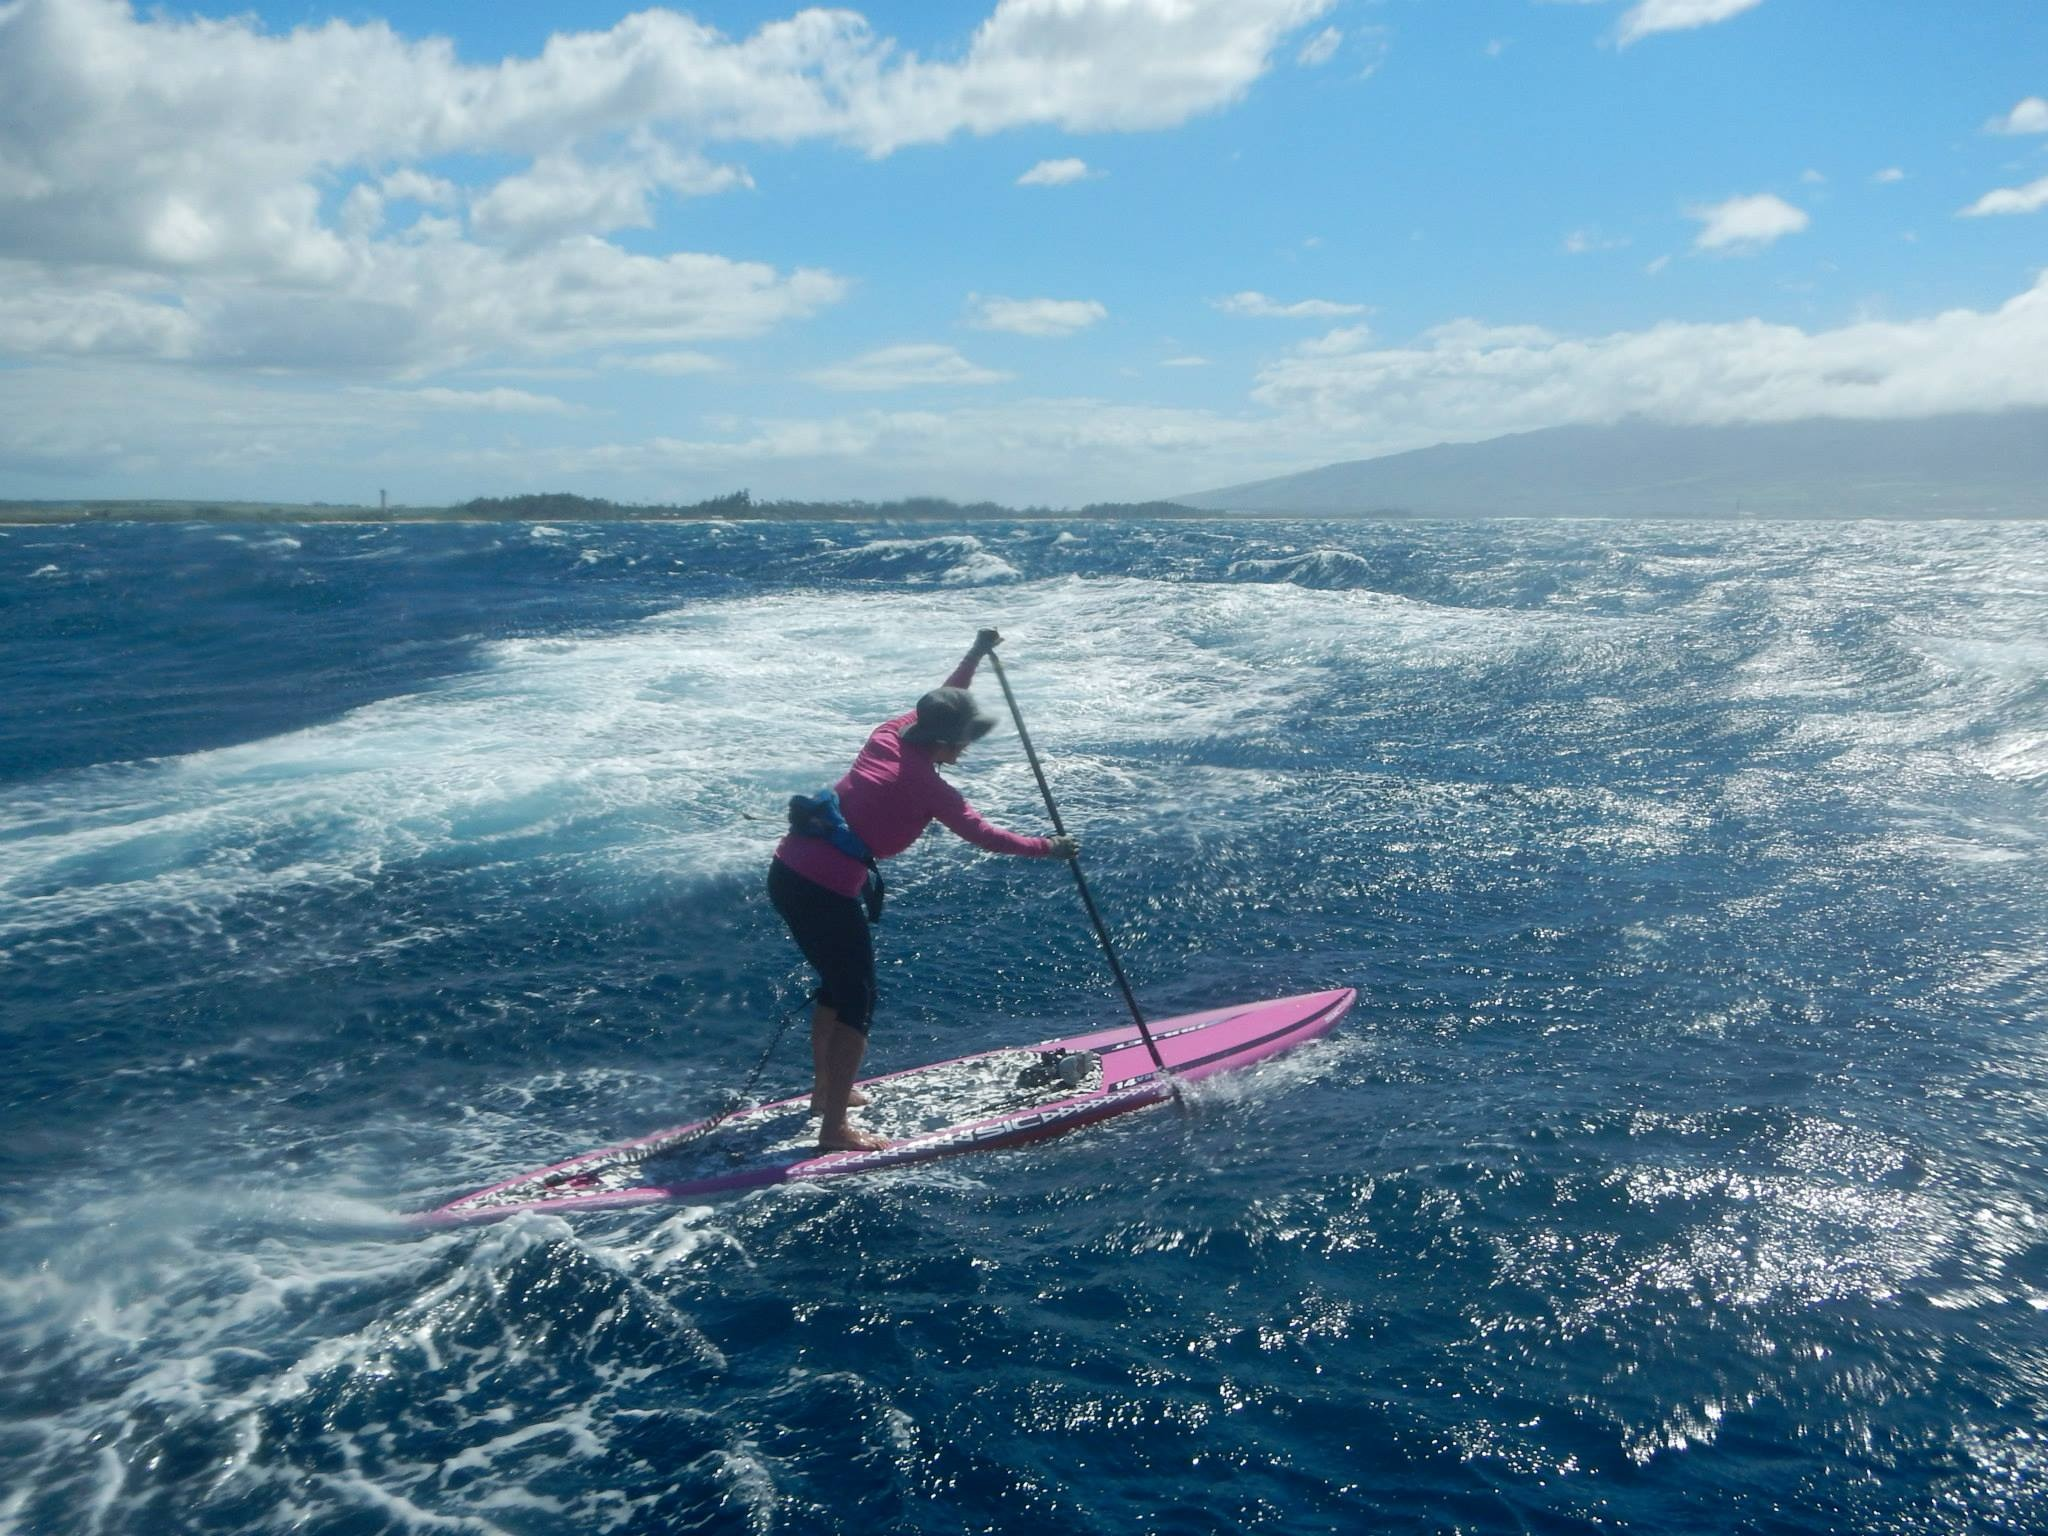 Maui 2 Molokai | Elder SUP